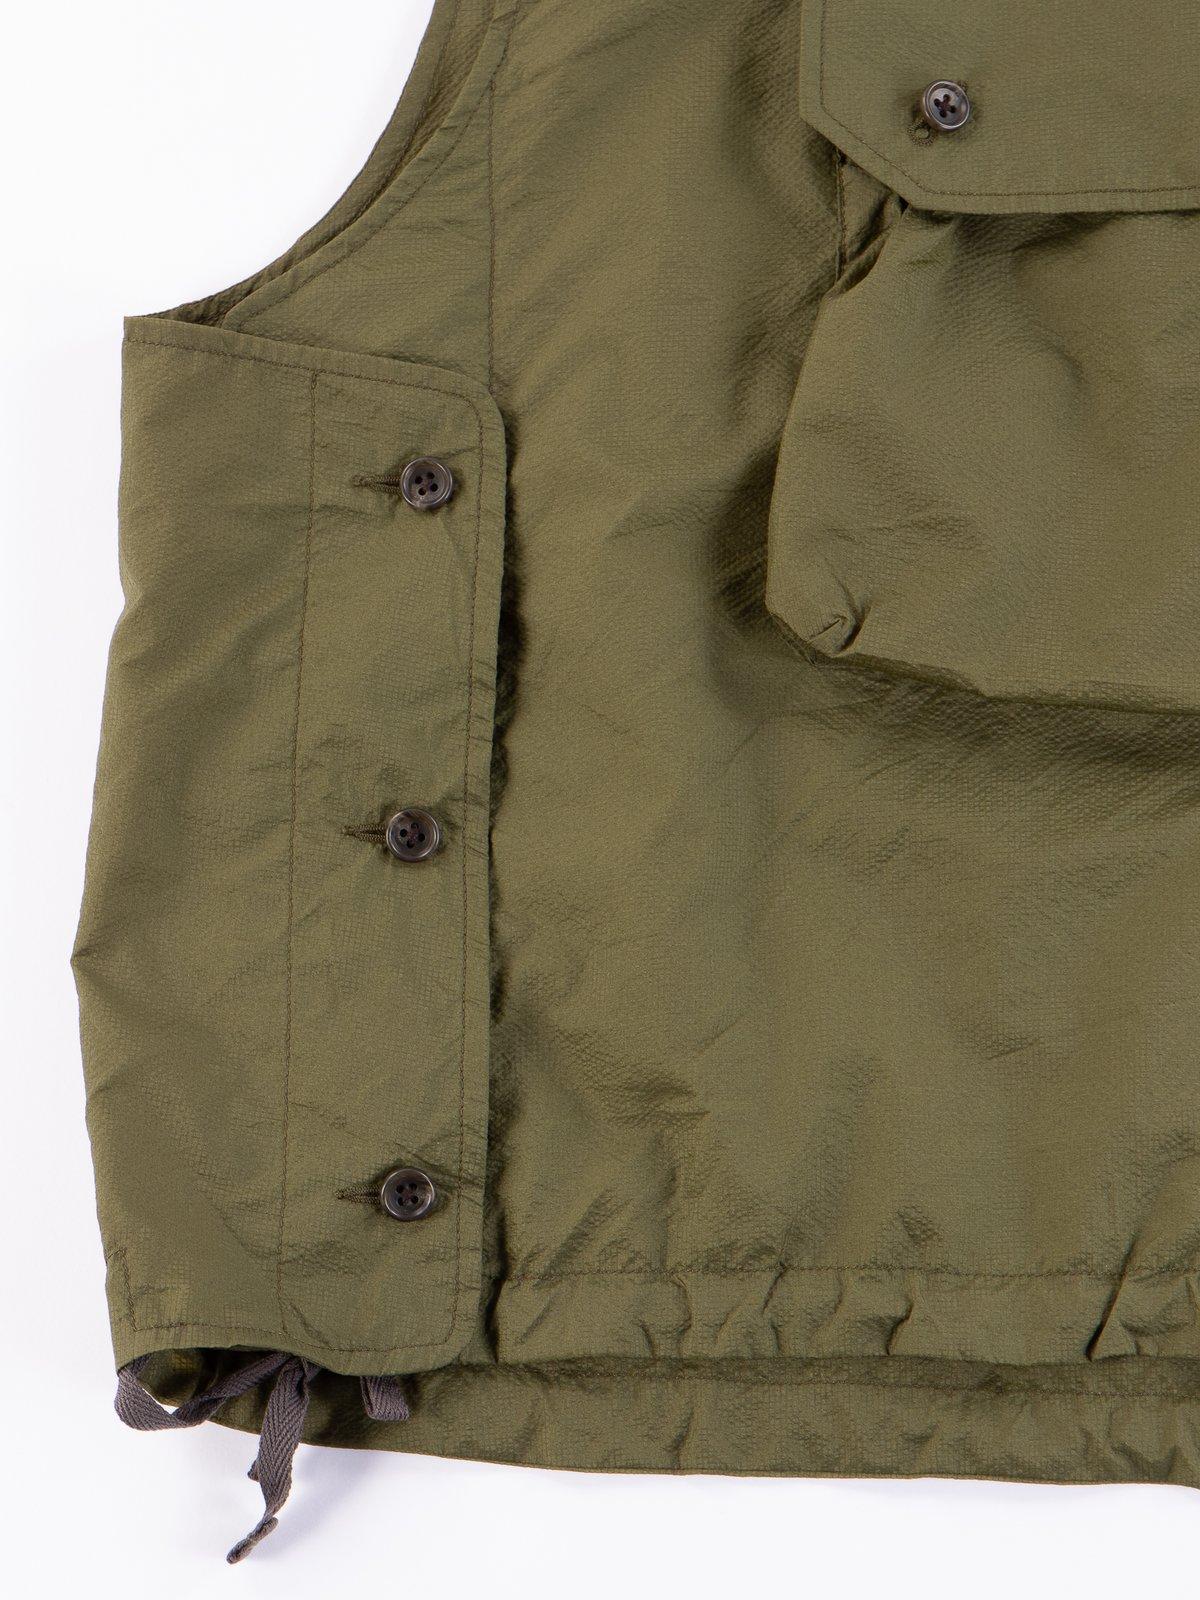 Olive Nylon Micro Ripstop Cover Vest - Image 4